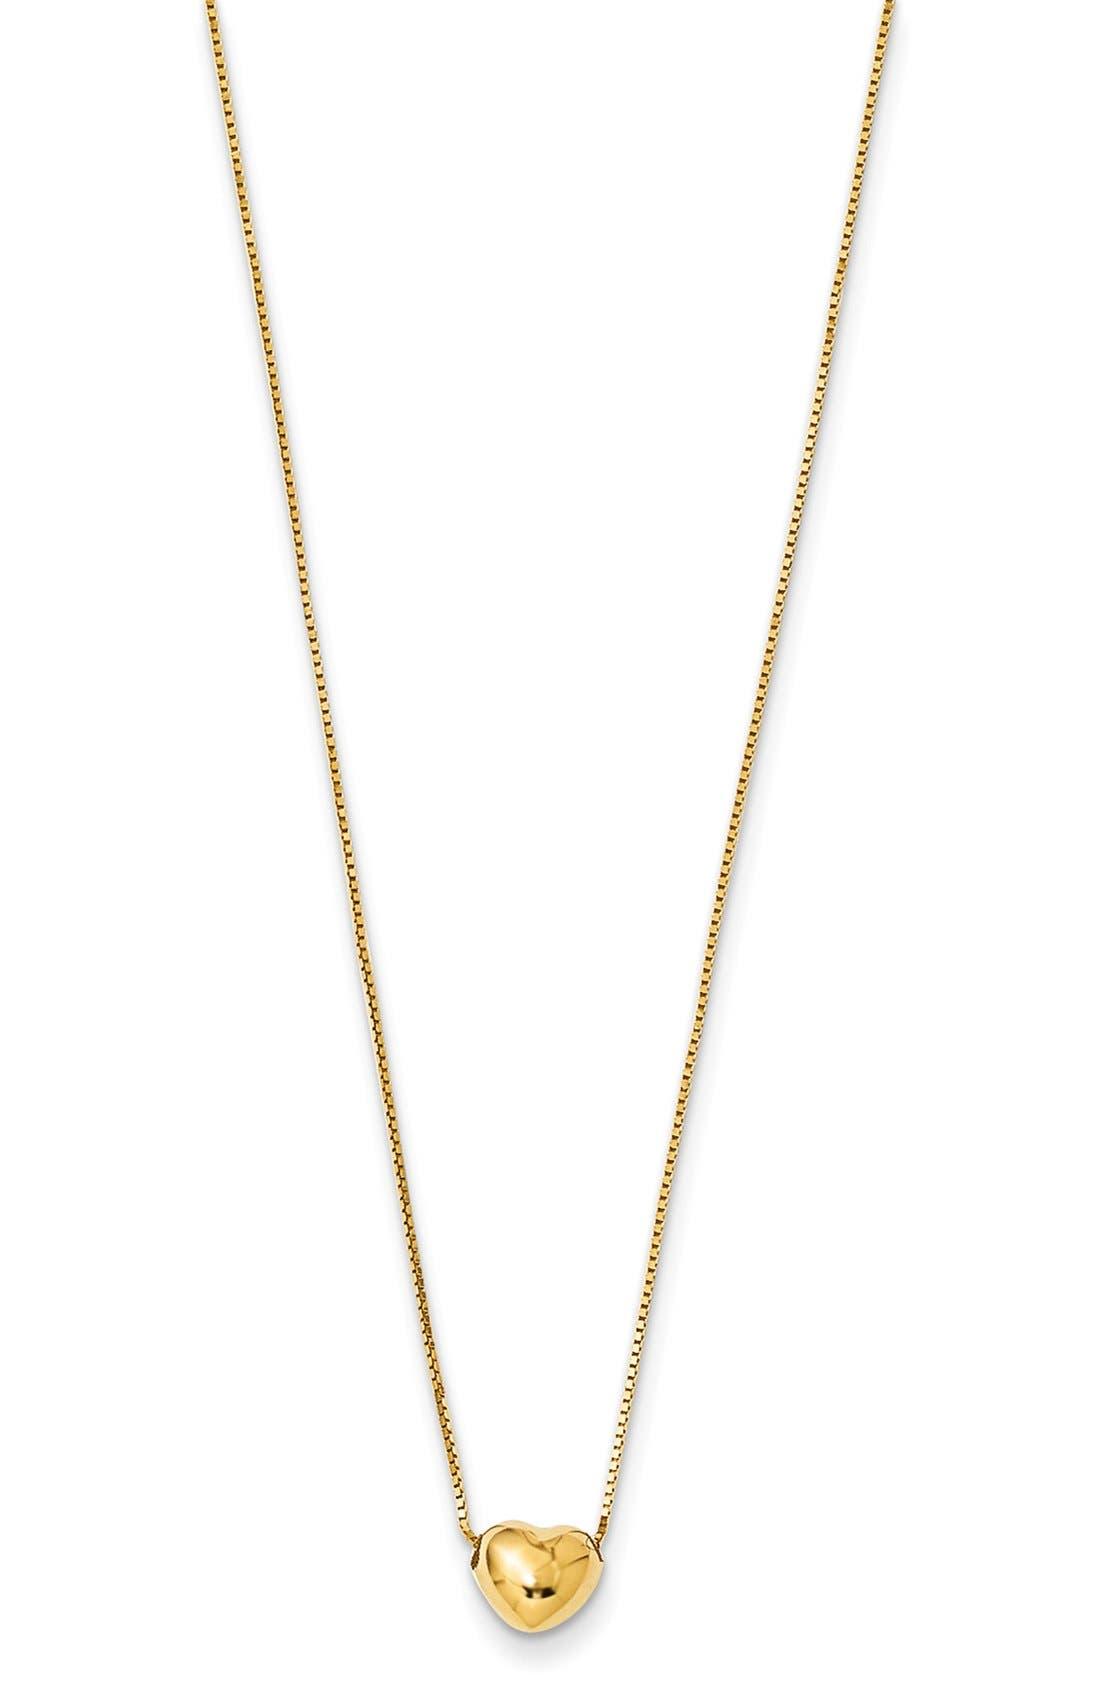 KARDEE JEWELRY Heart Pendant Necklace